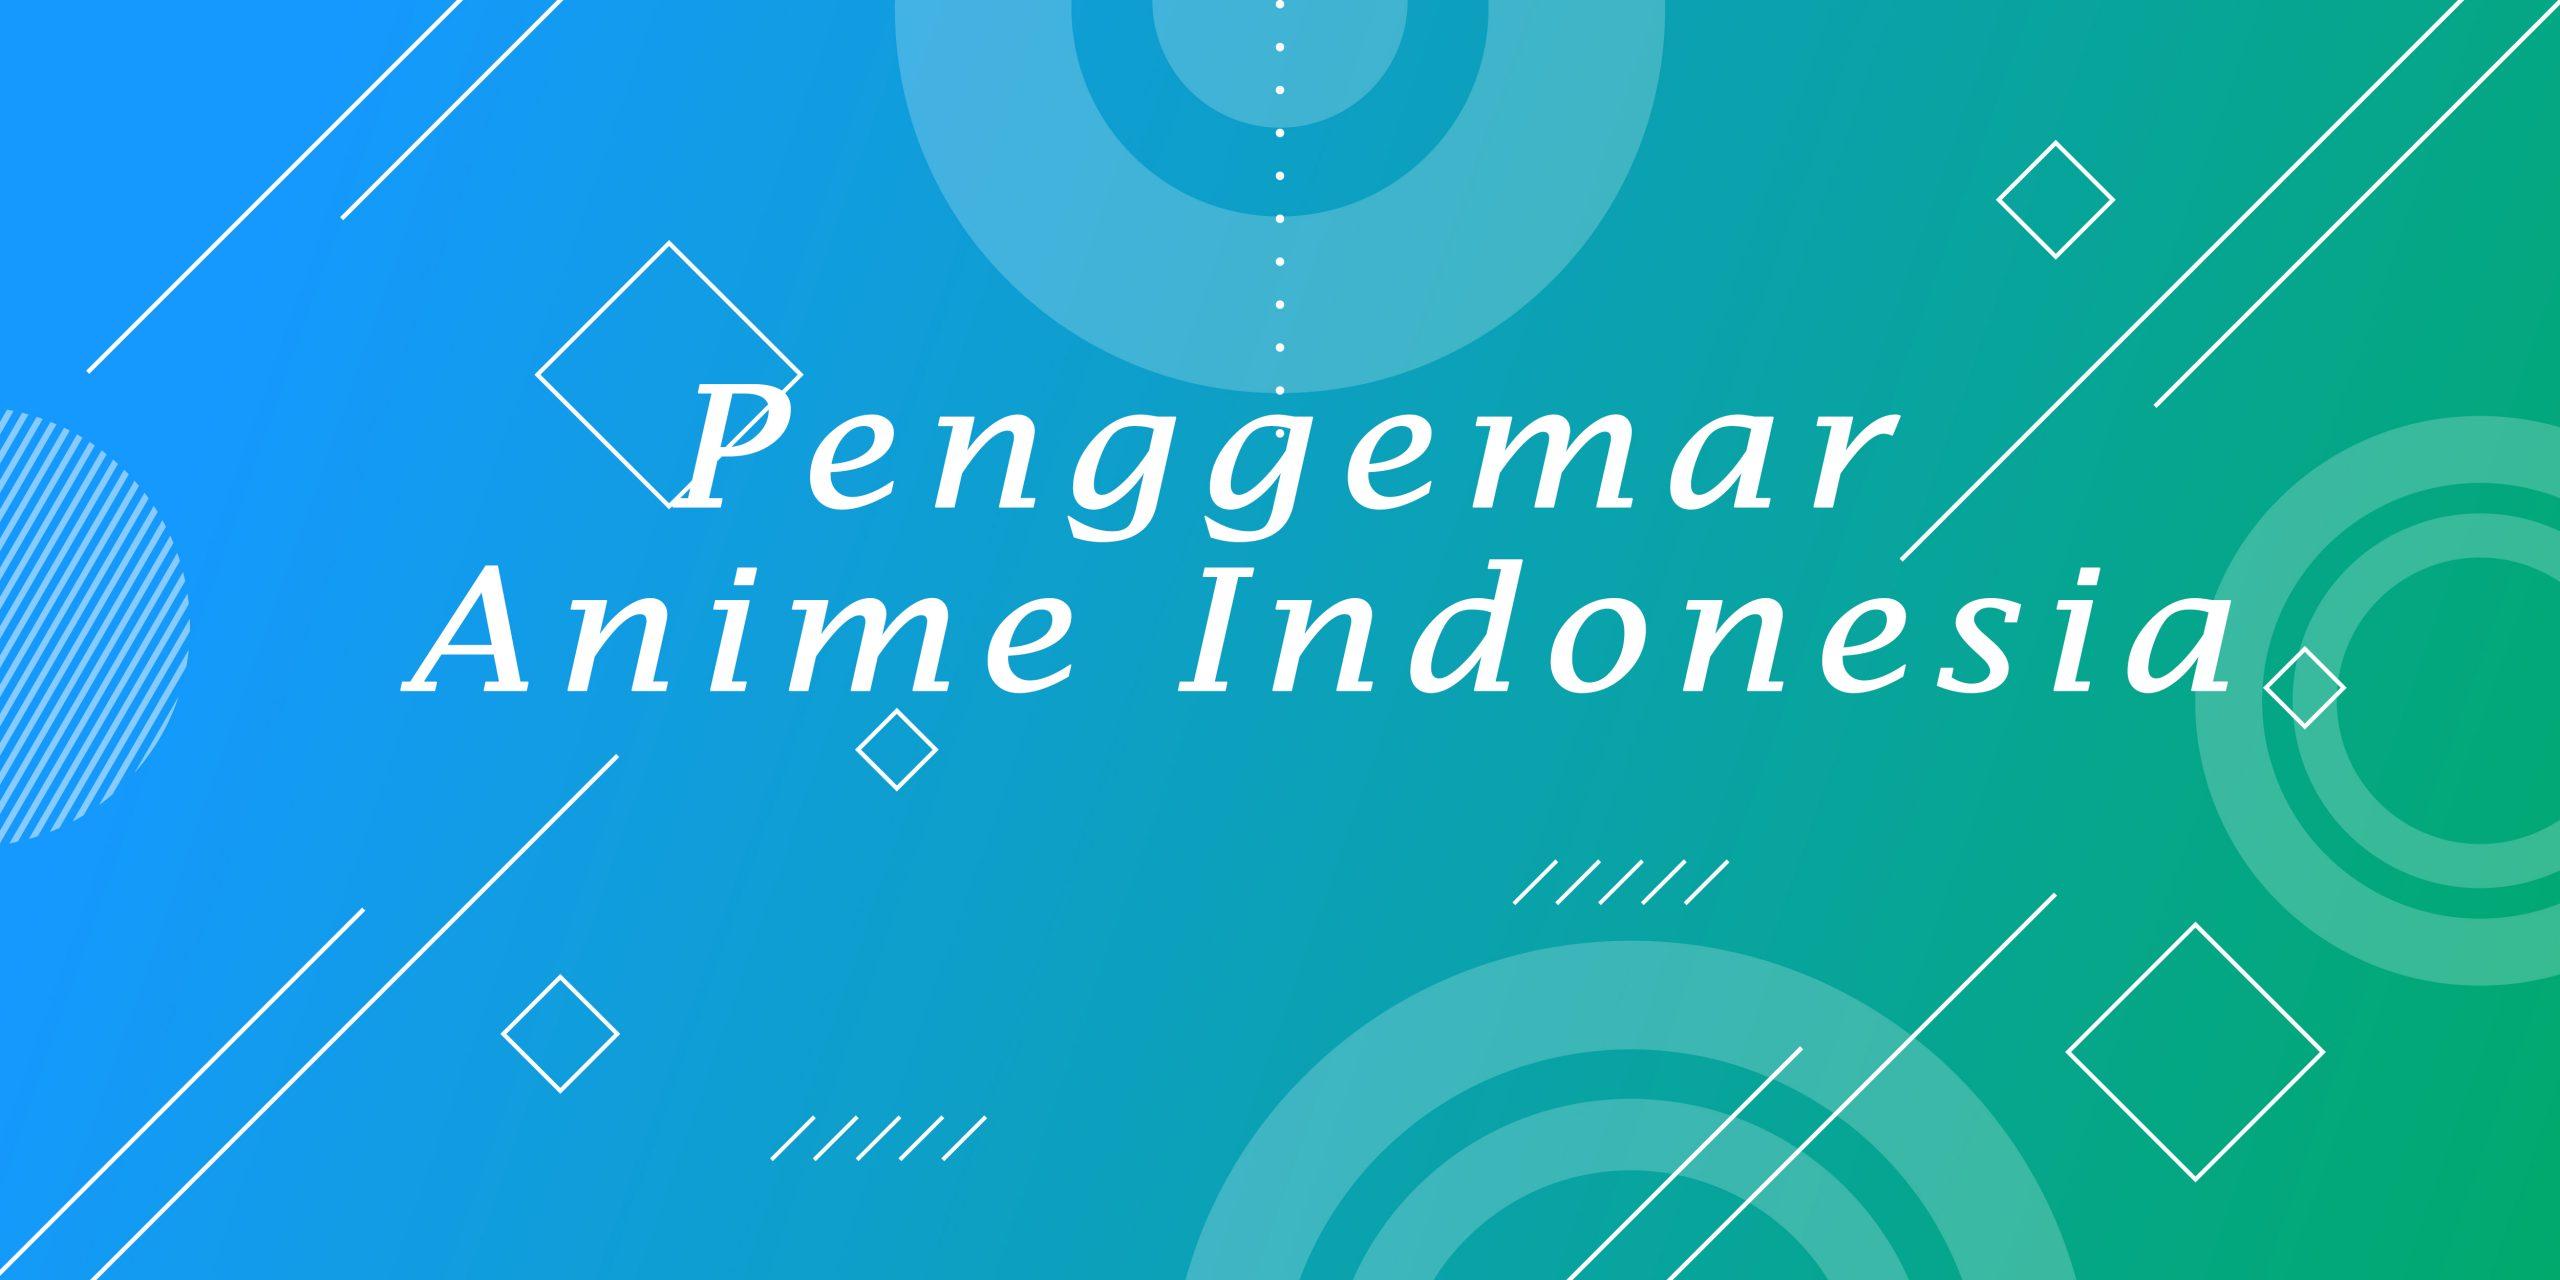 Penggemar Anime Indonesia